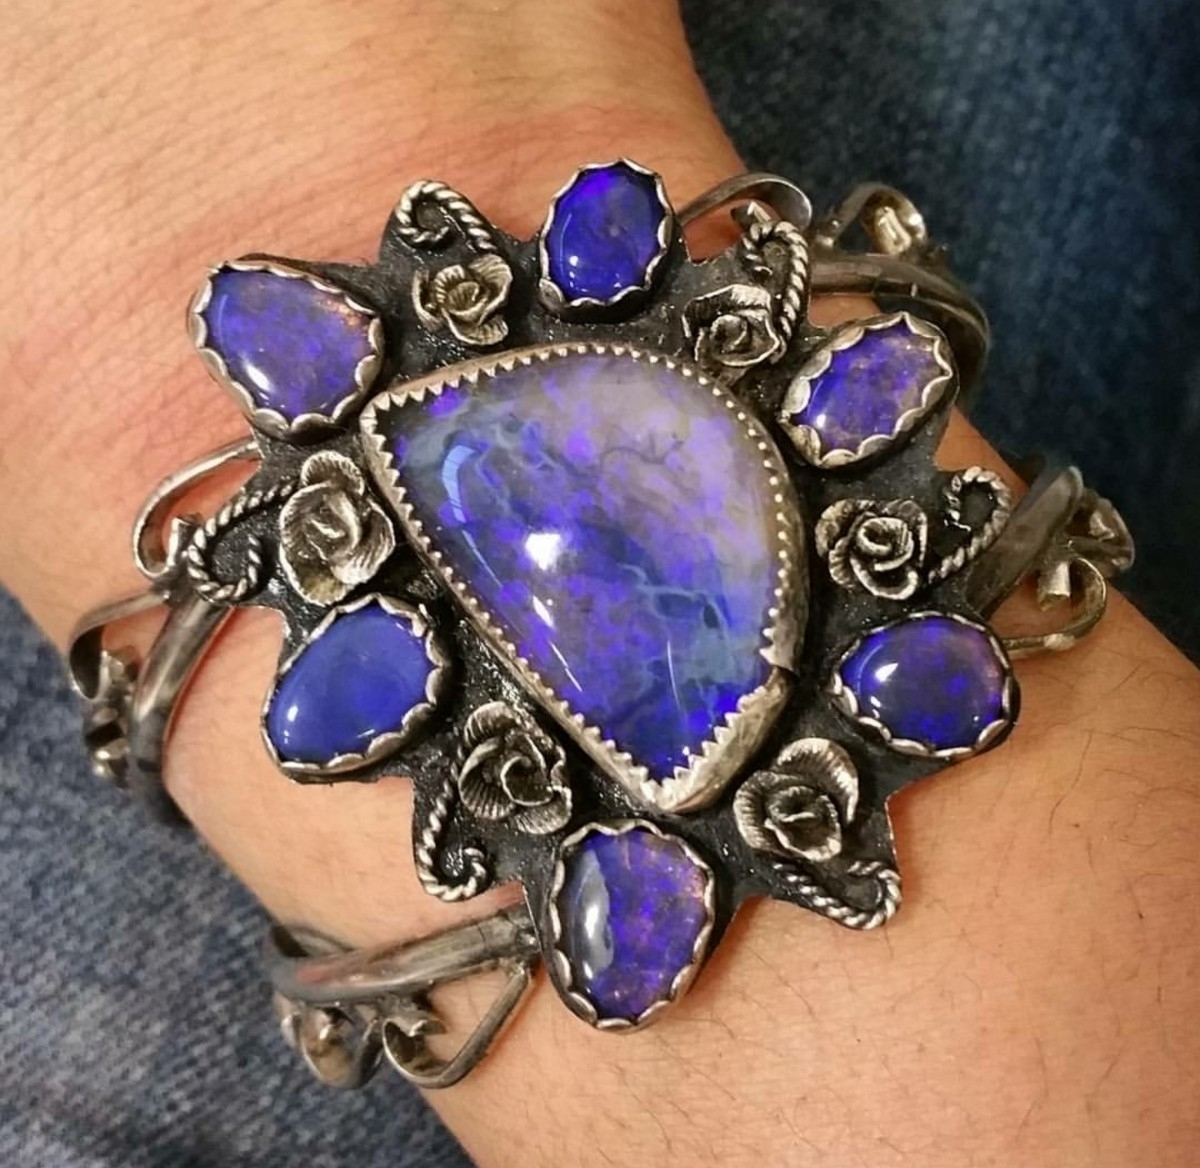 Black opal favorite stone. gorg - newerajewels | ello